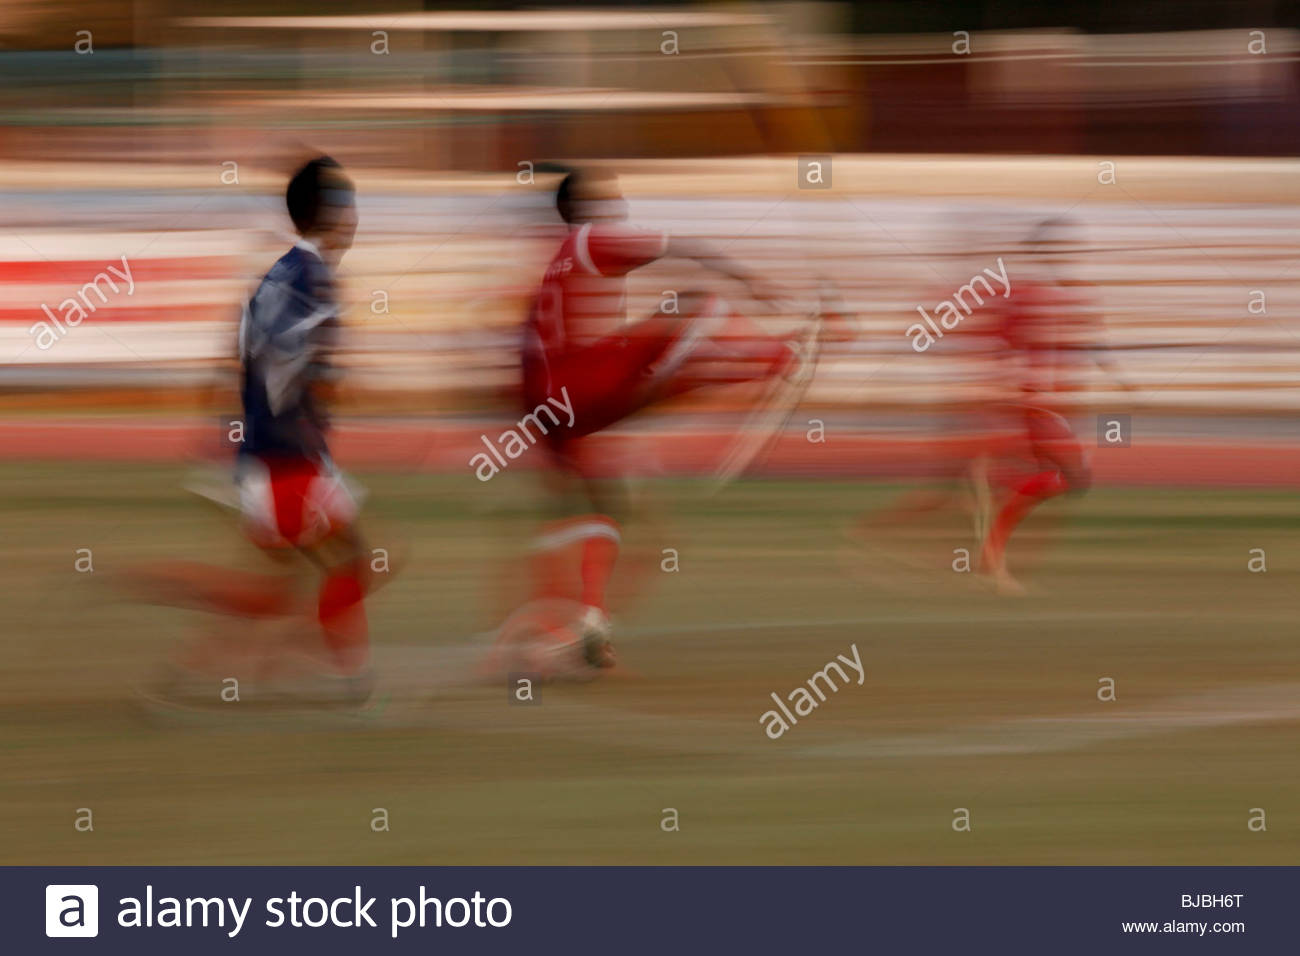 FOOTBALL MATCH IN TRIVANDRUM, KERALA - Stock Image